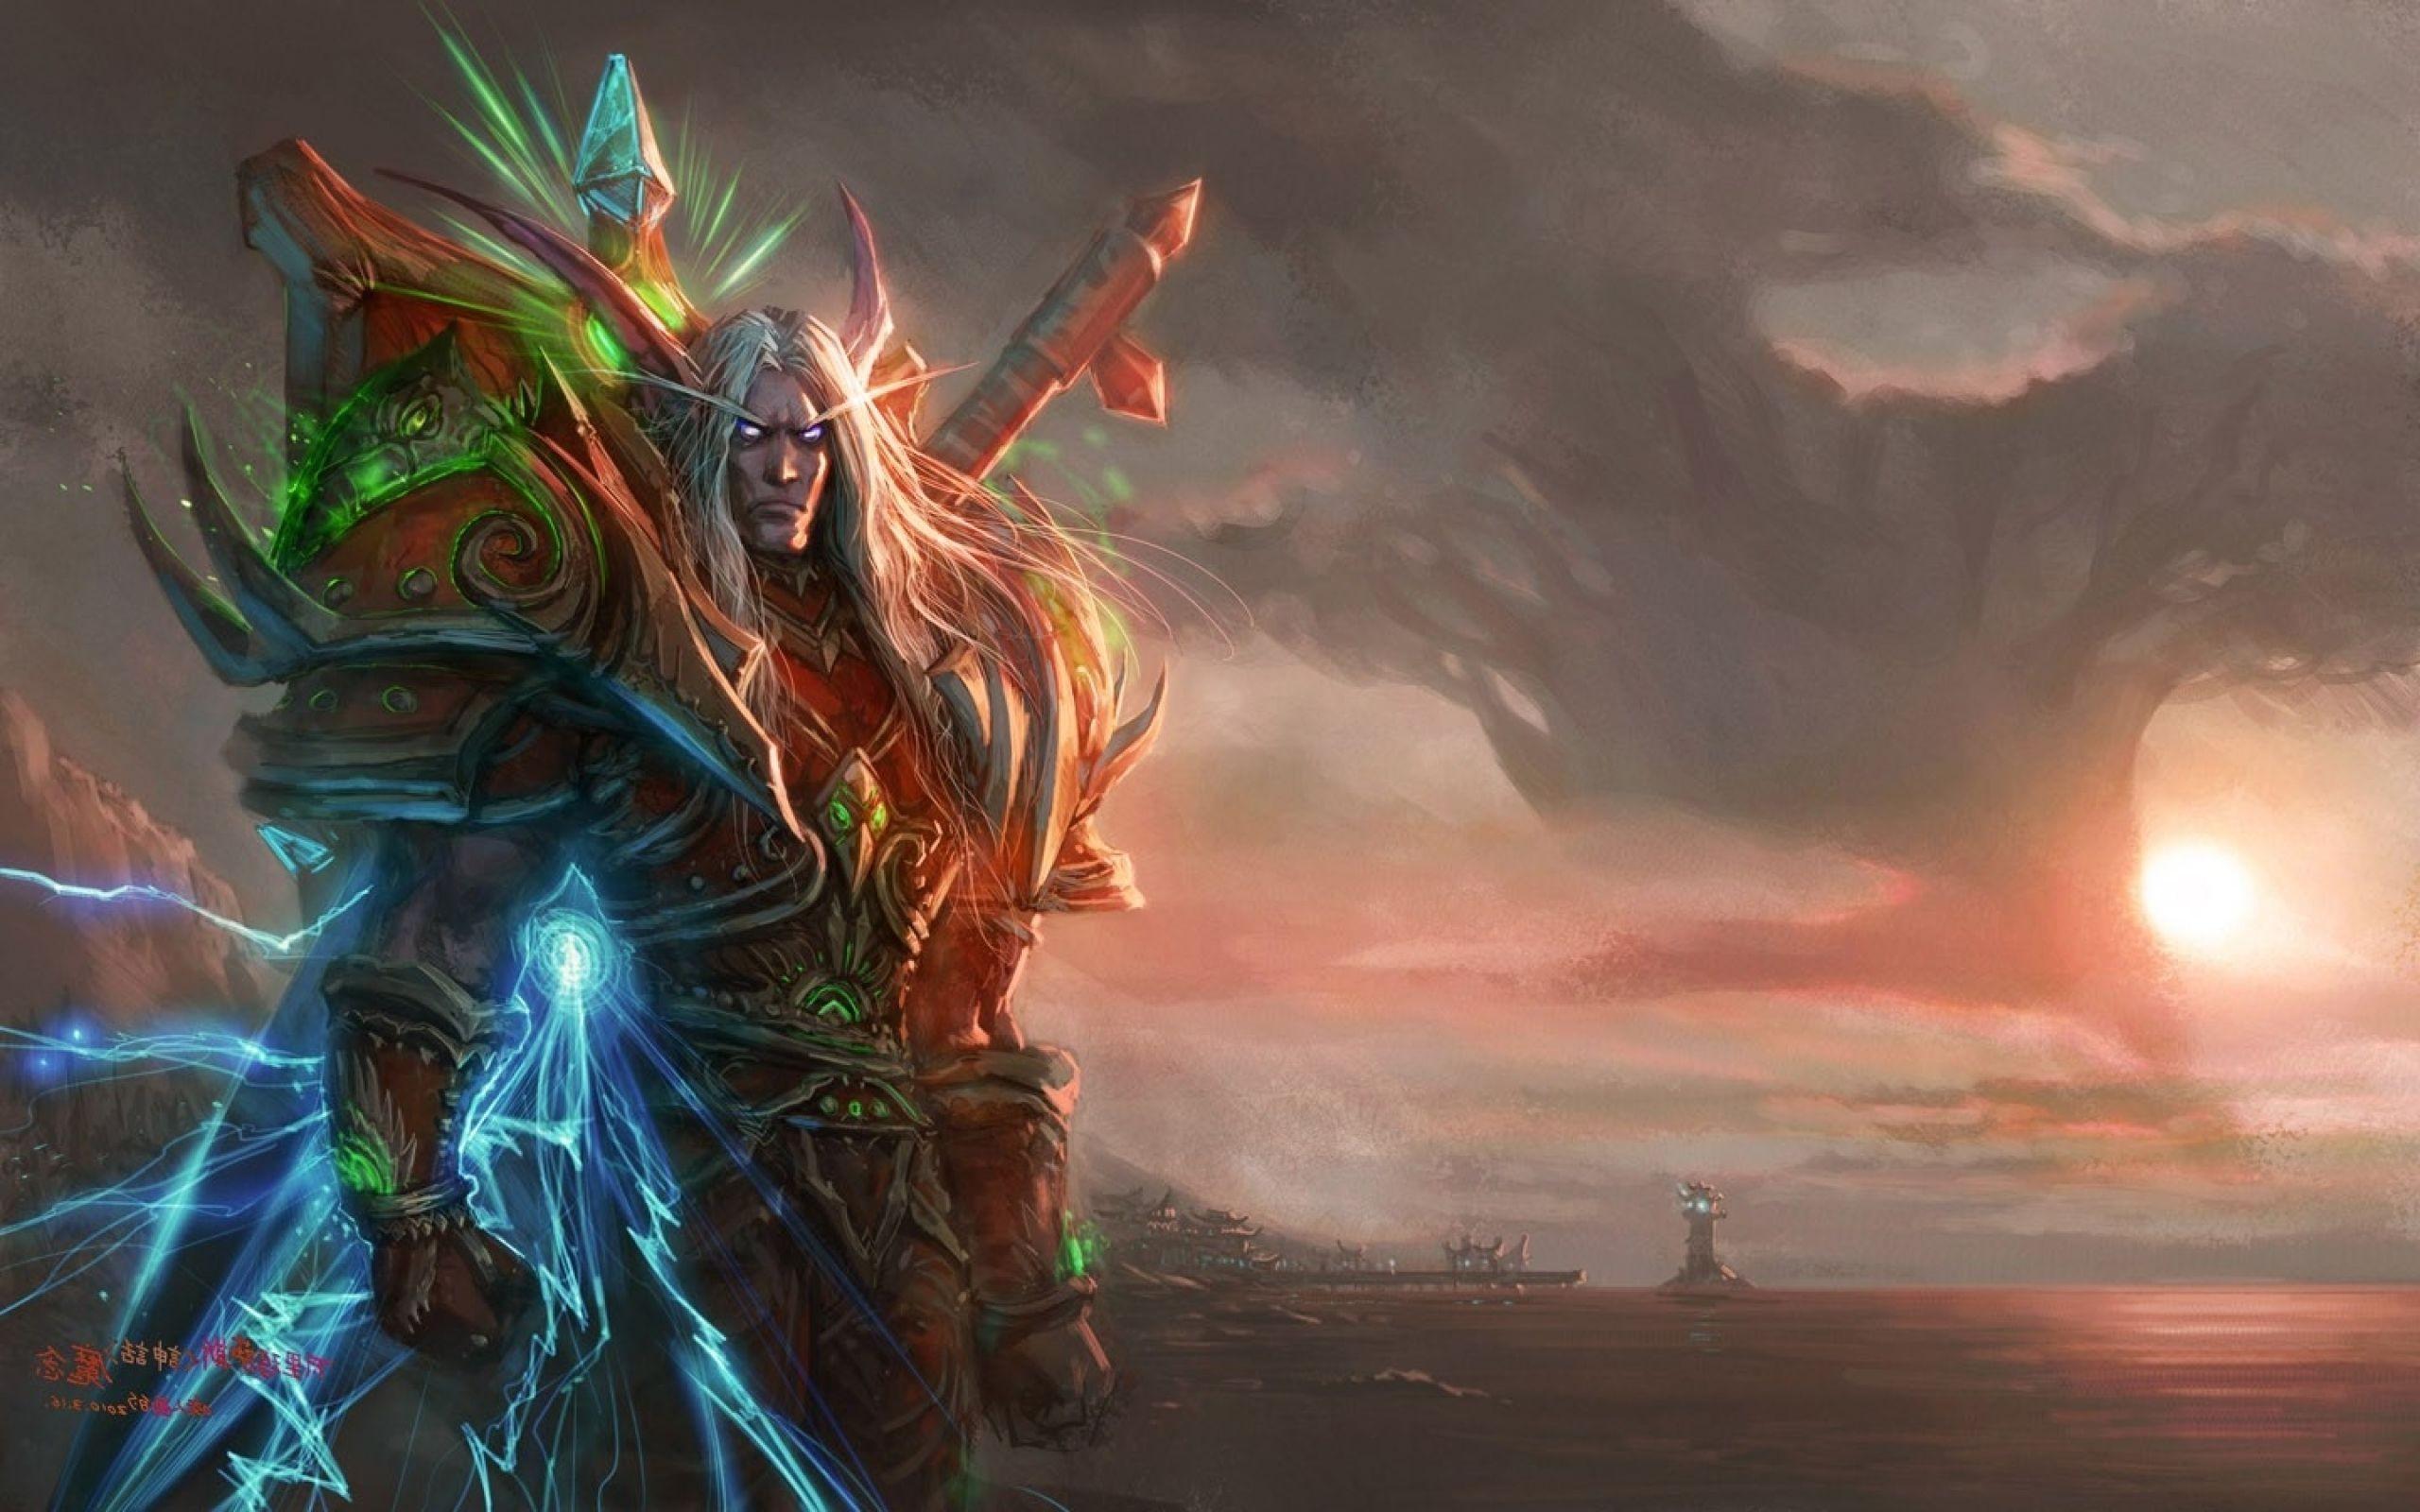 World Of Warcraft Wallpaper Hd Paladin 74 Images